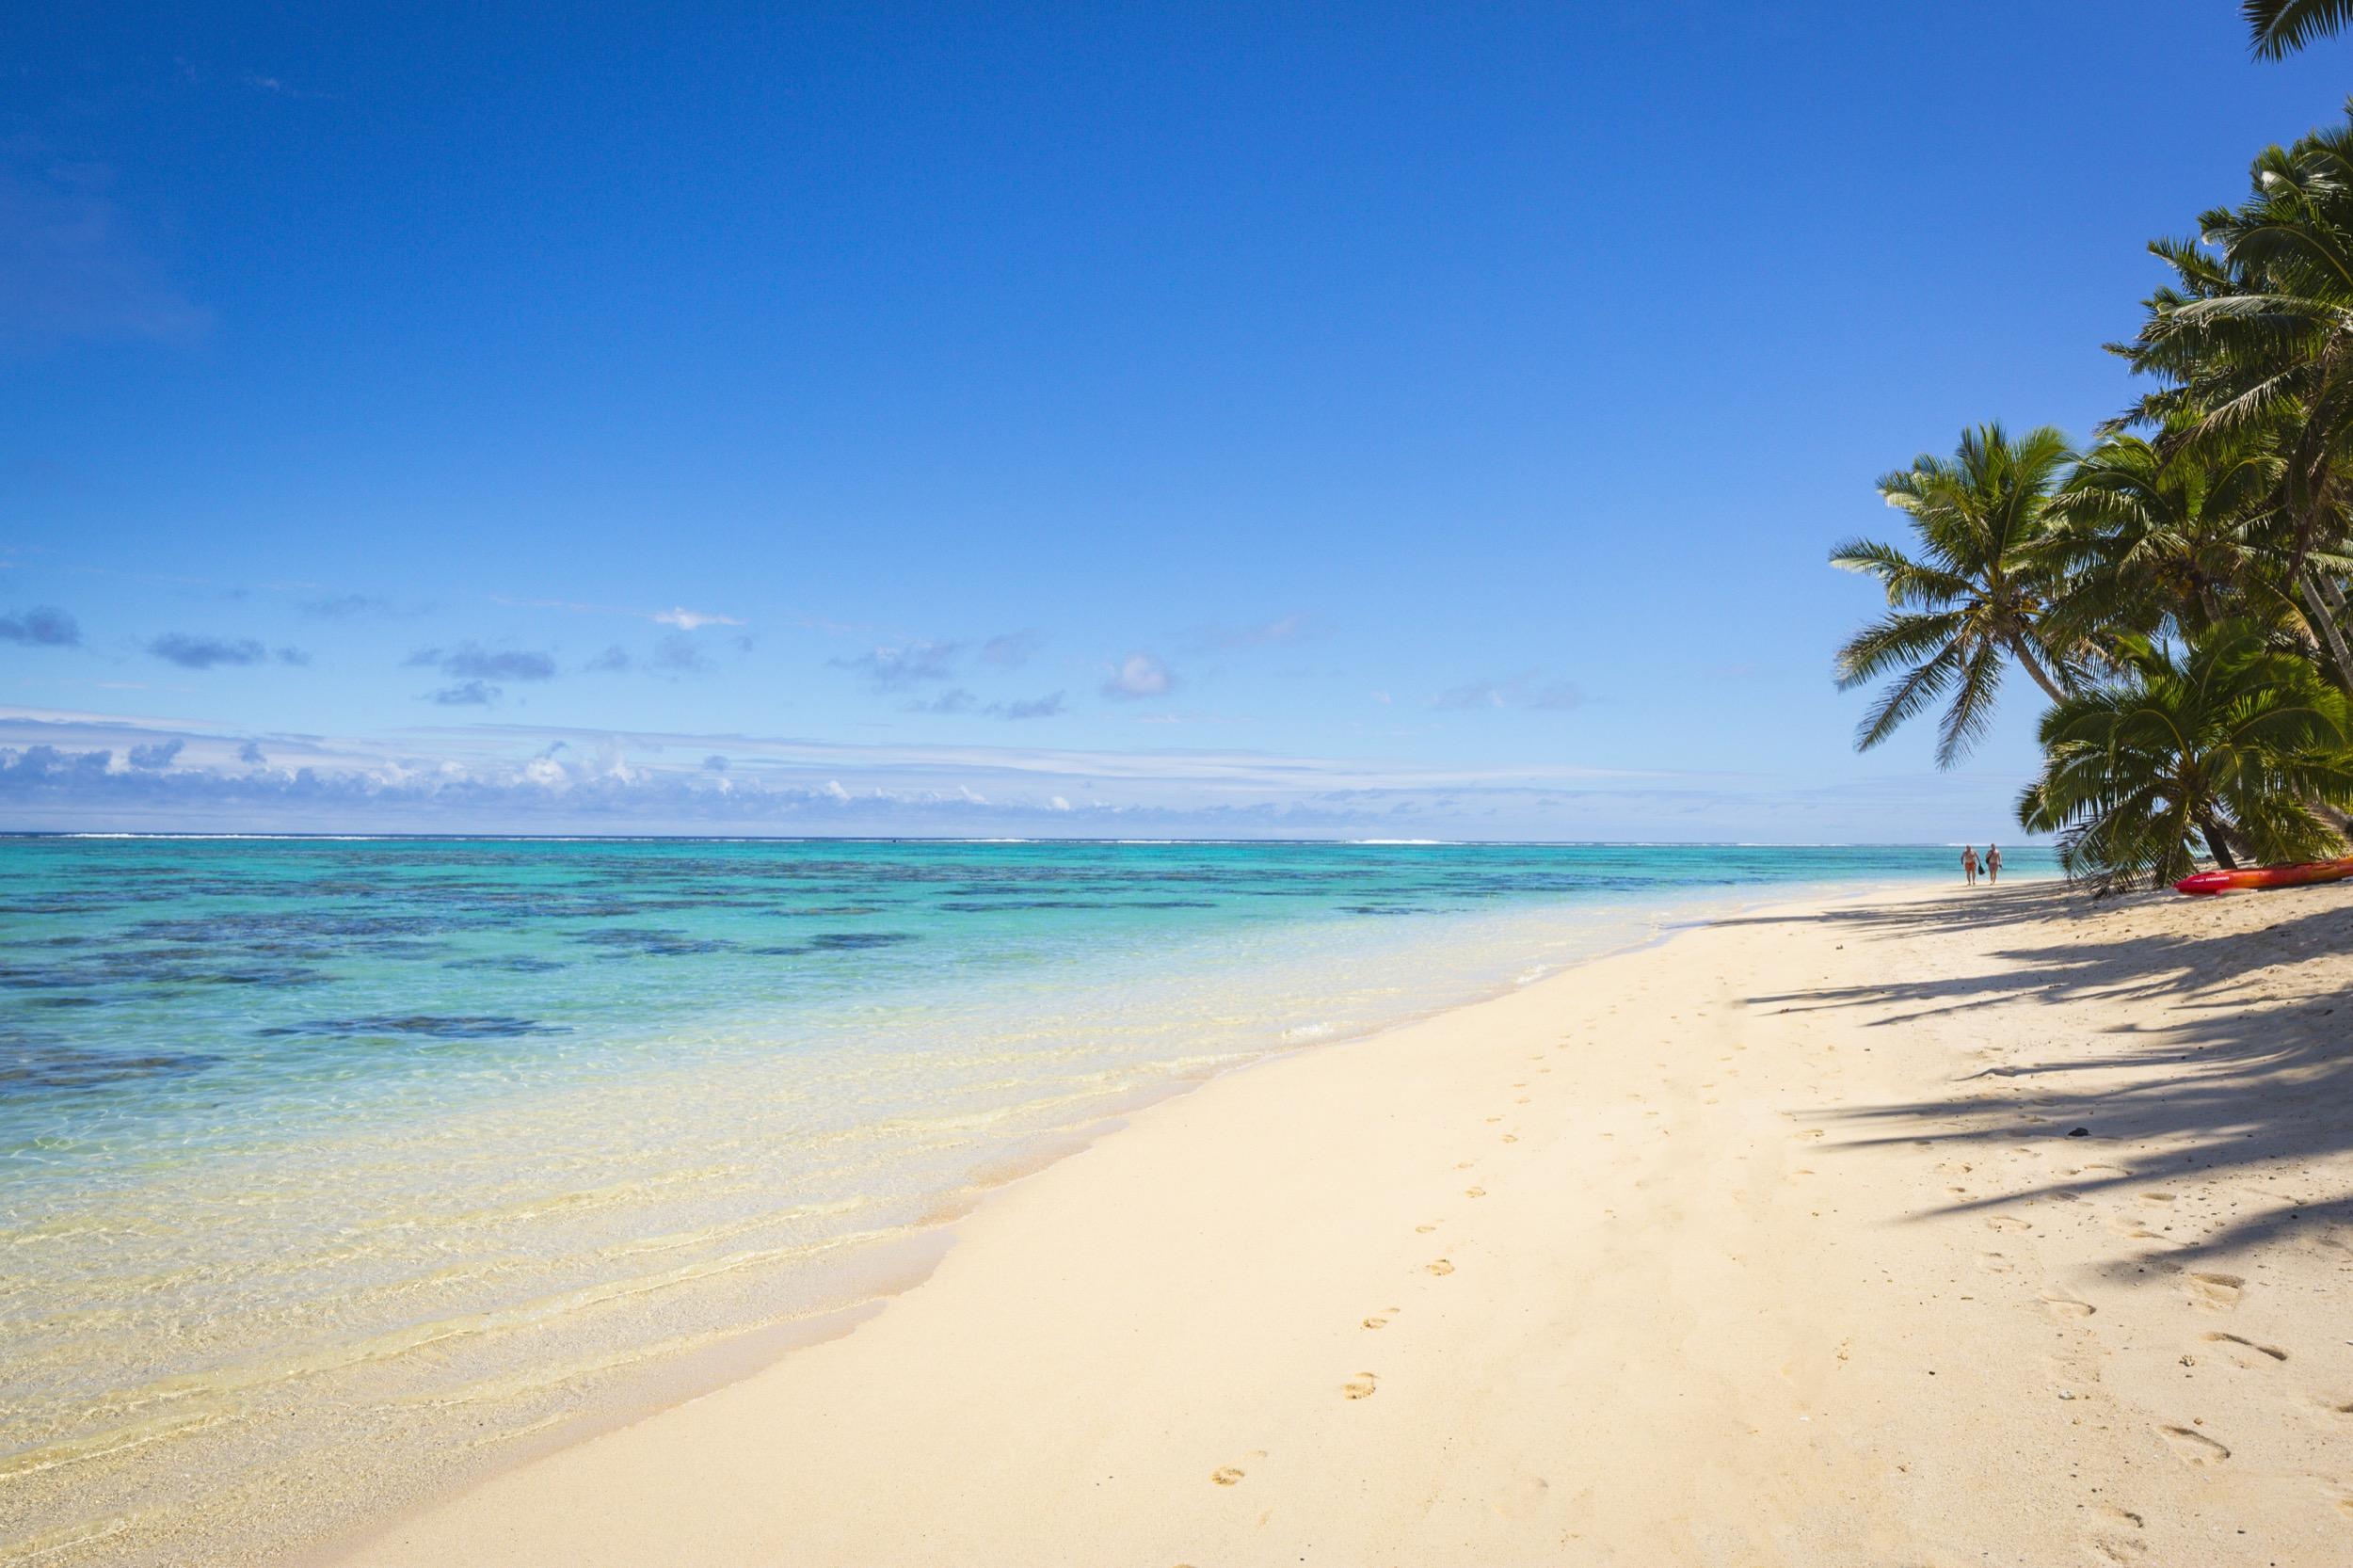 beach looking towards during daytime 2.jpg